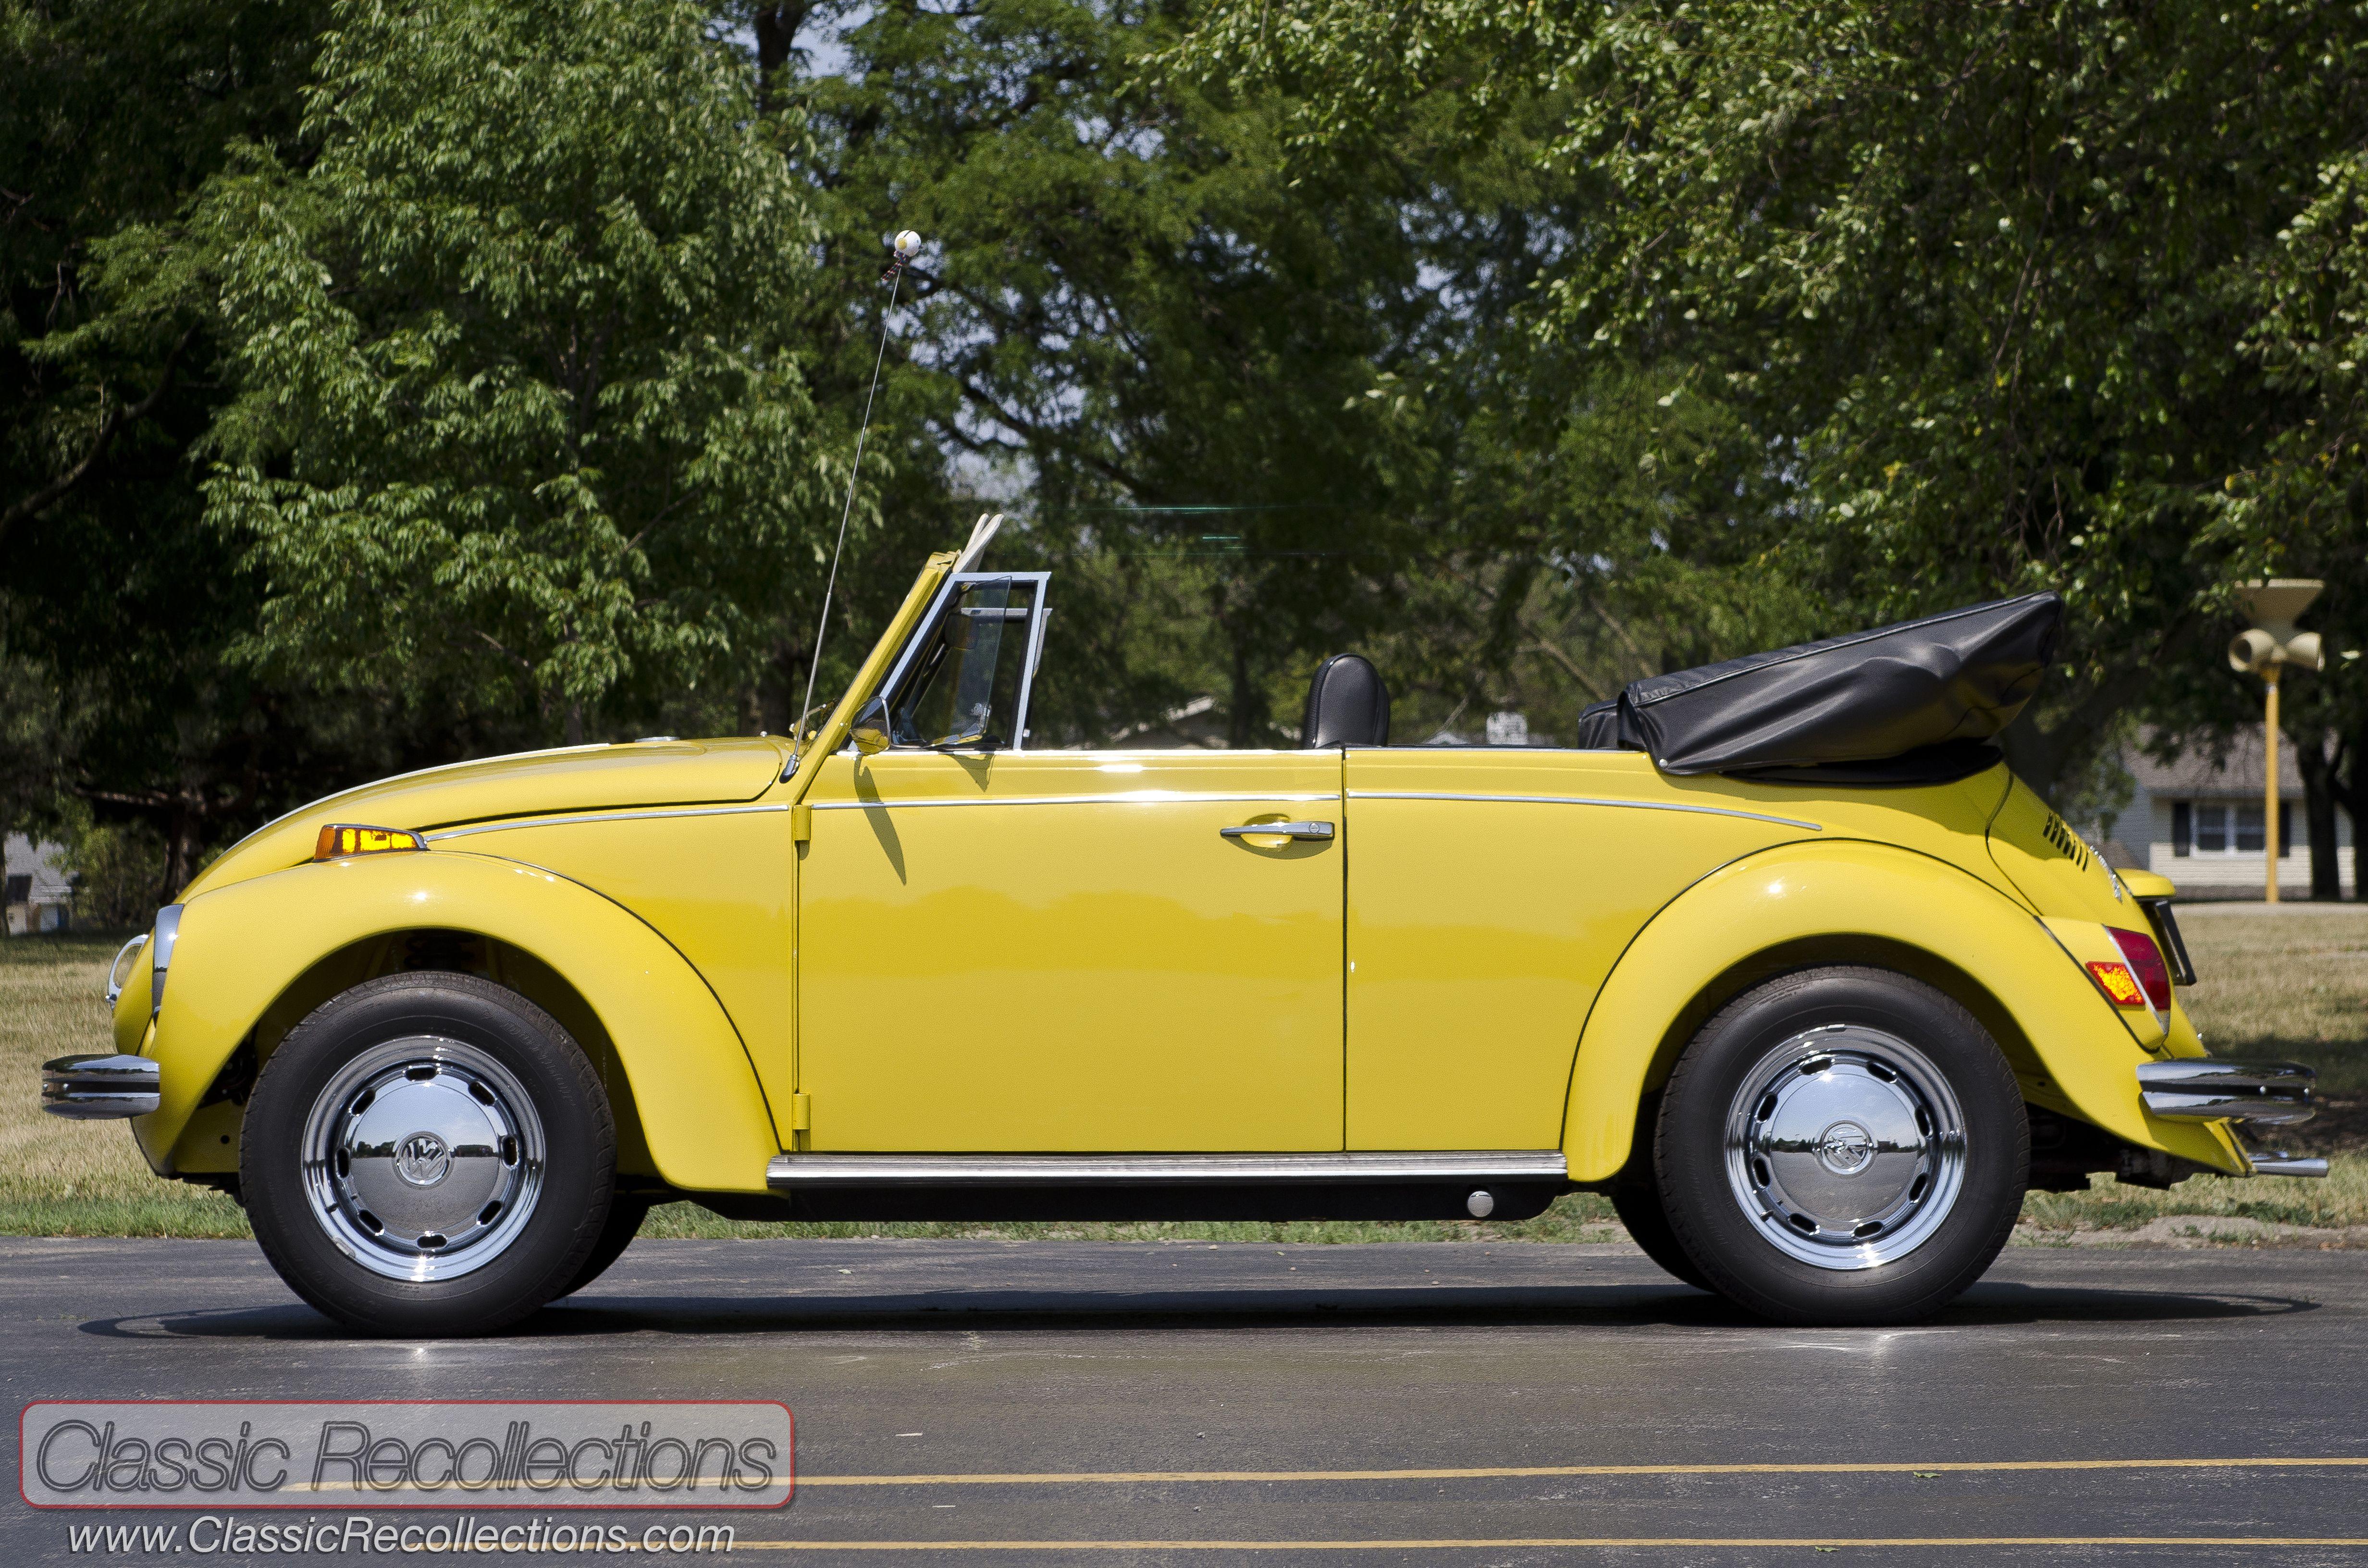 Feature 1971 Vw Super Beetle